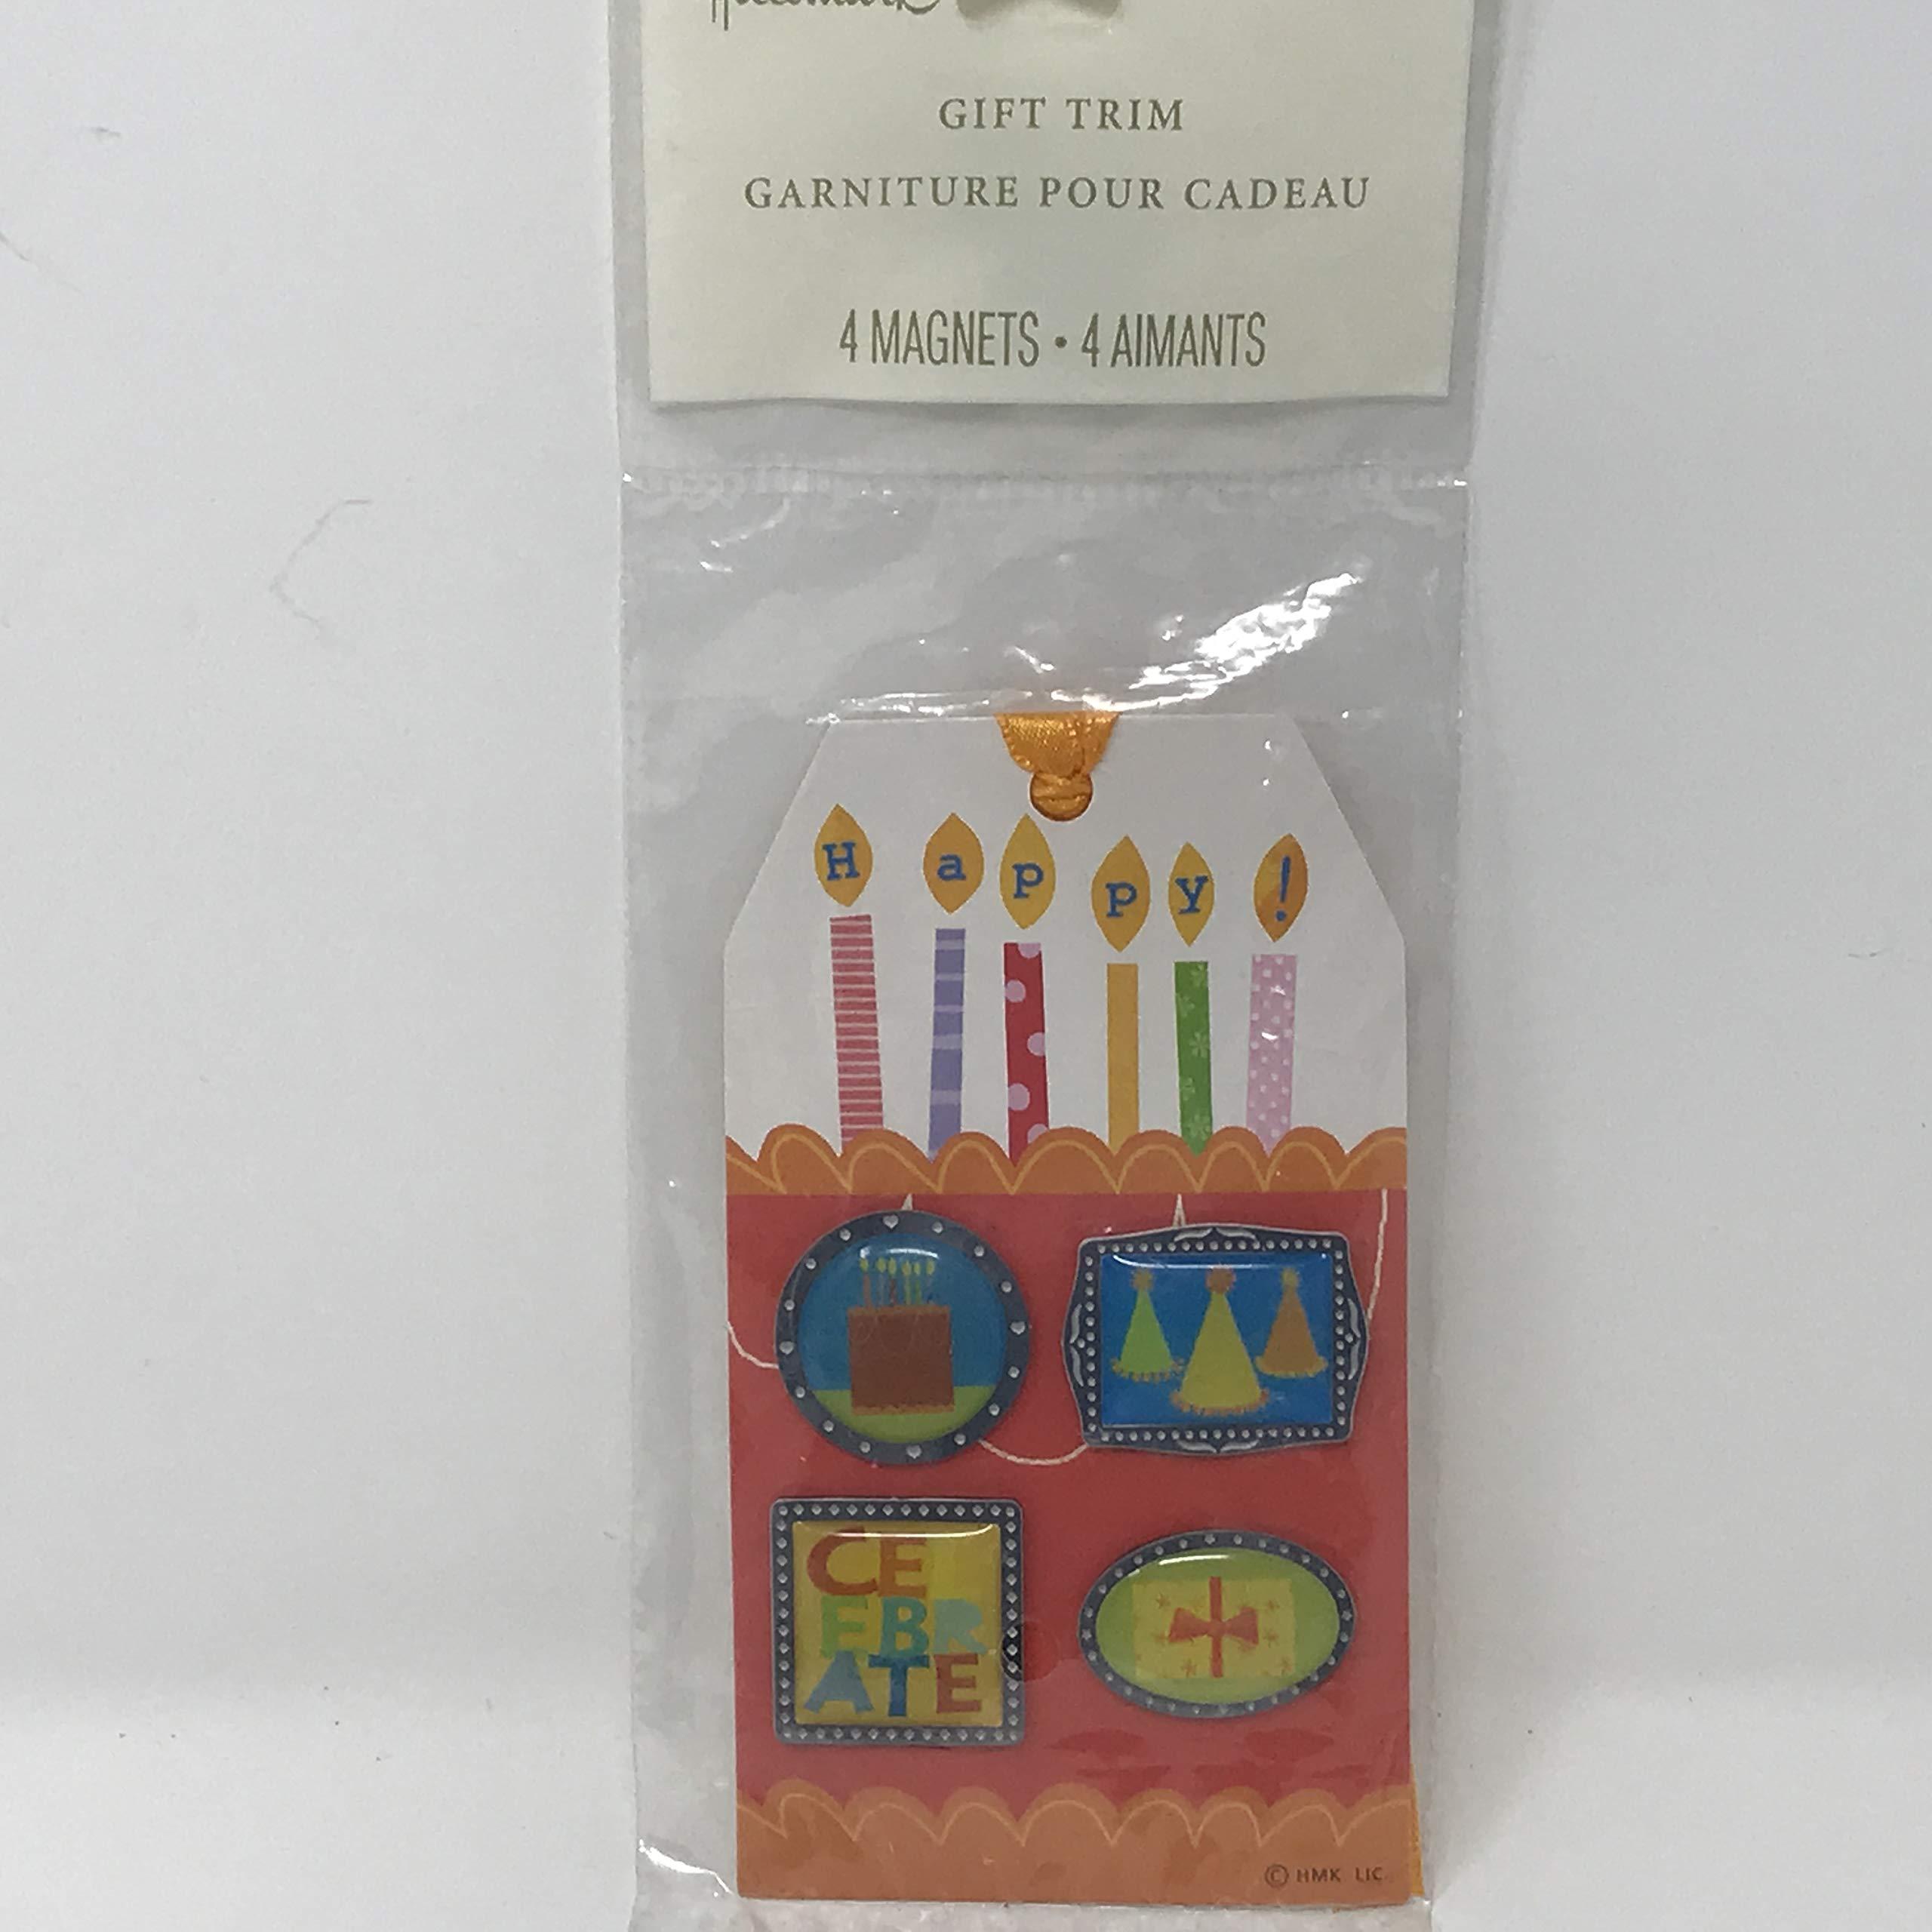 Hallmark Gift Trim Tag with 4 Magnets (Birthday)